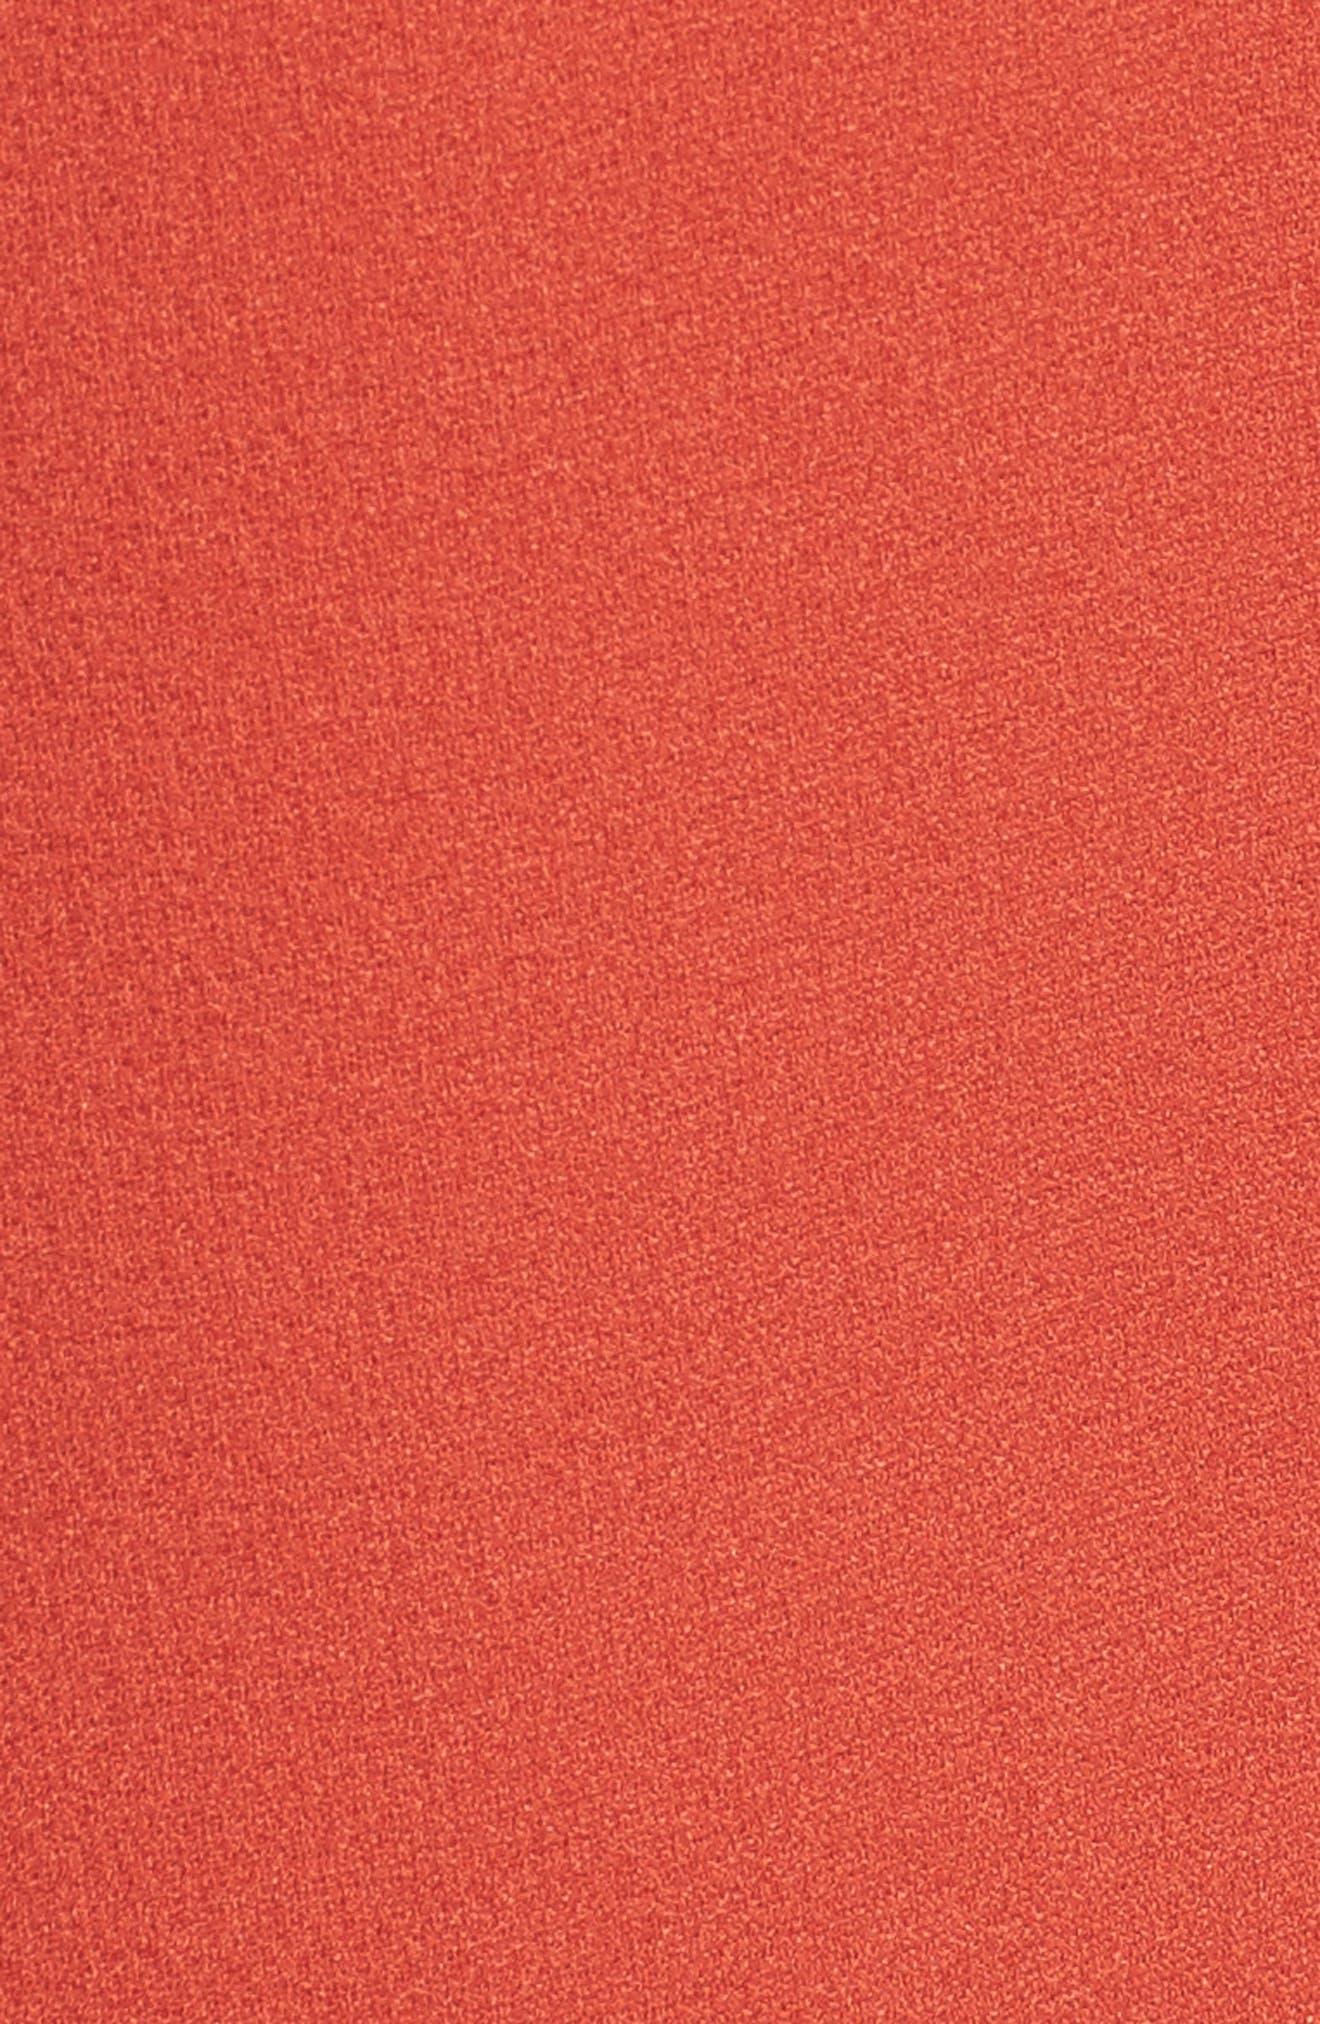 Hailey Crepe Dress,                             Alternate thumbnail 120, color,